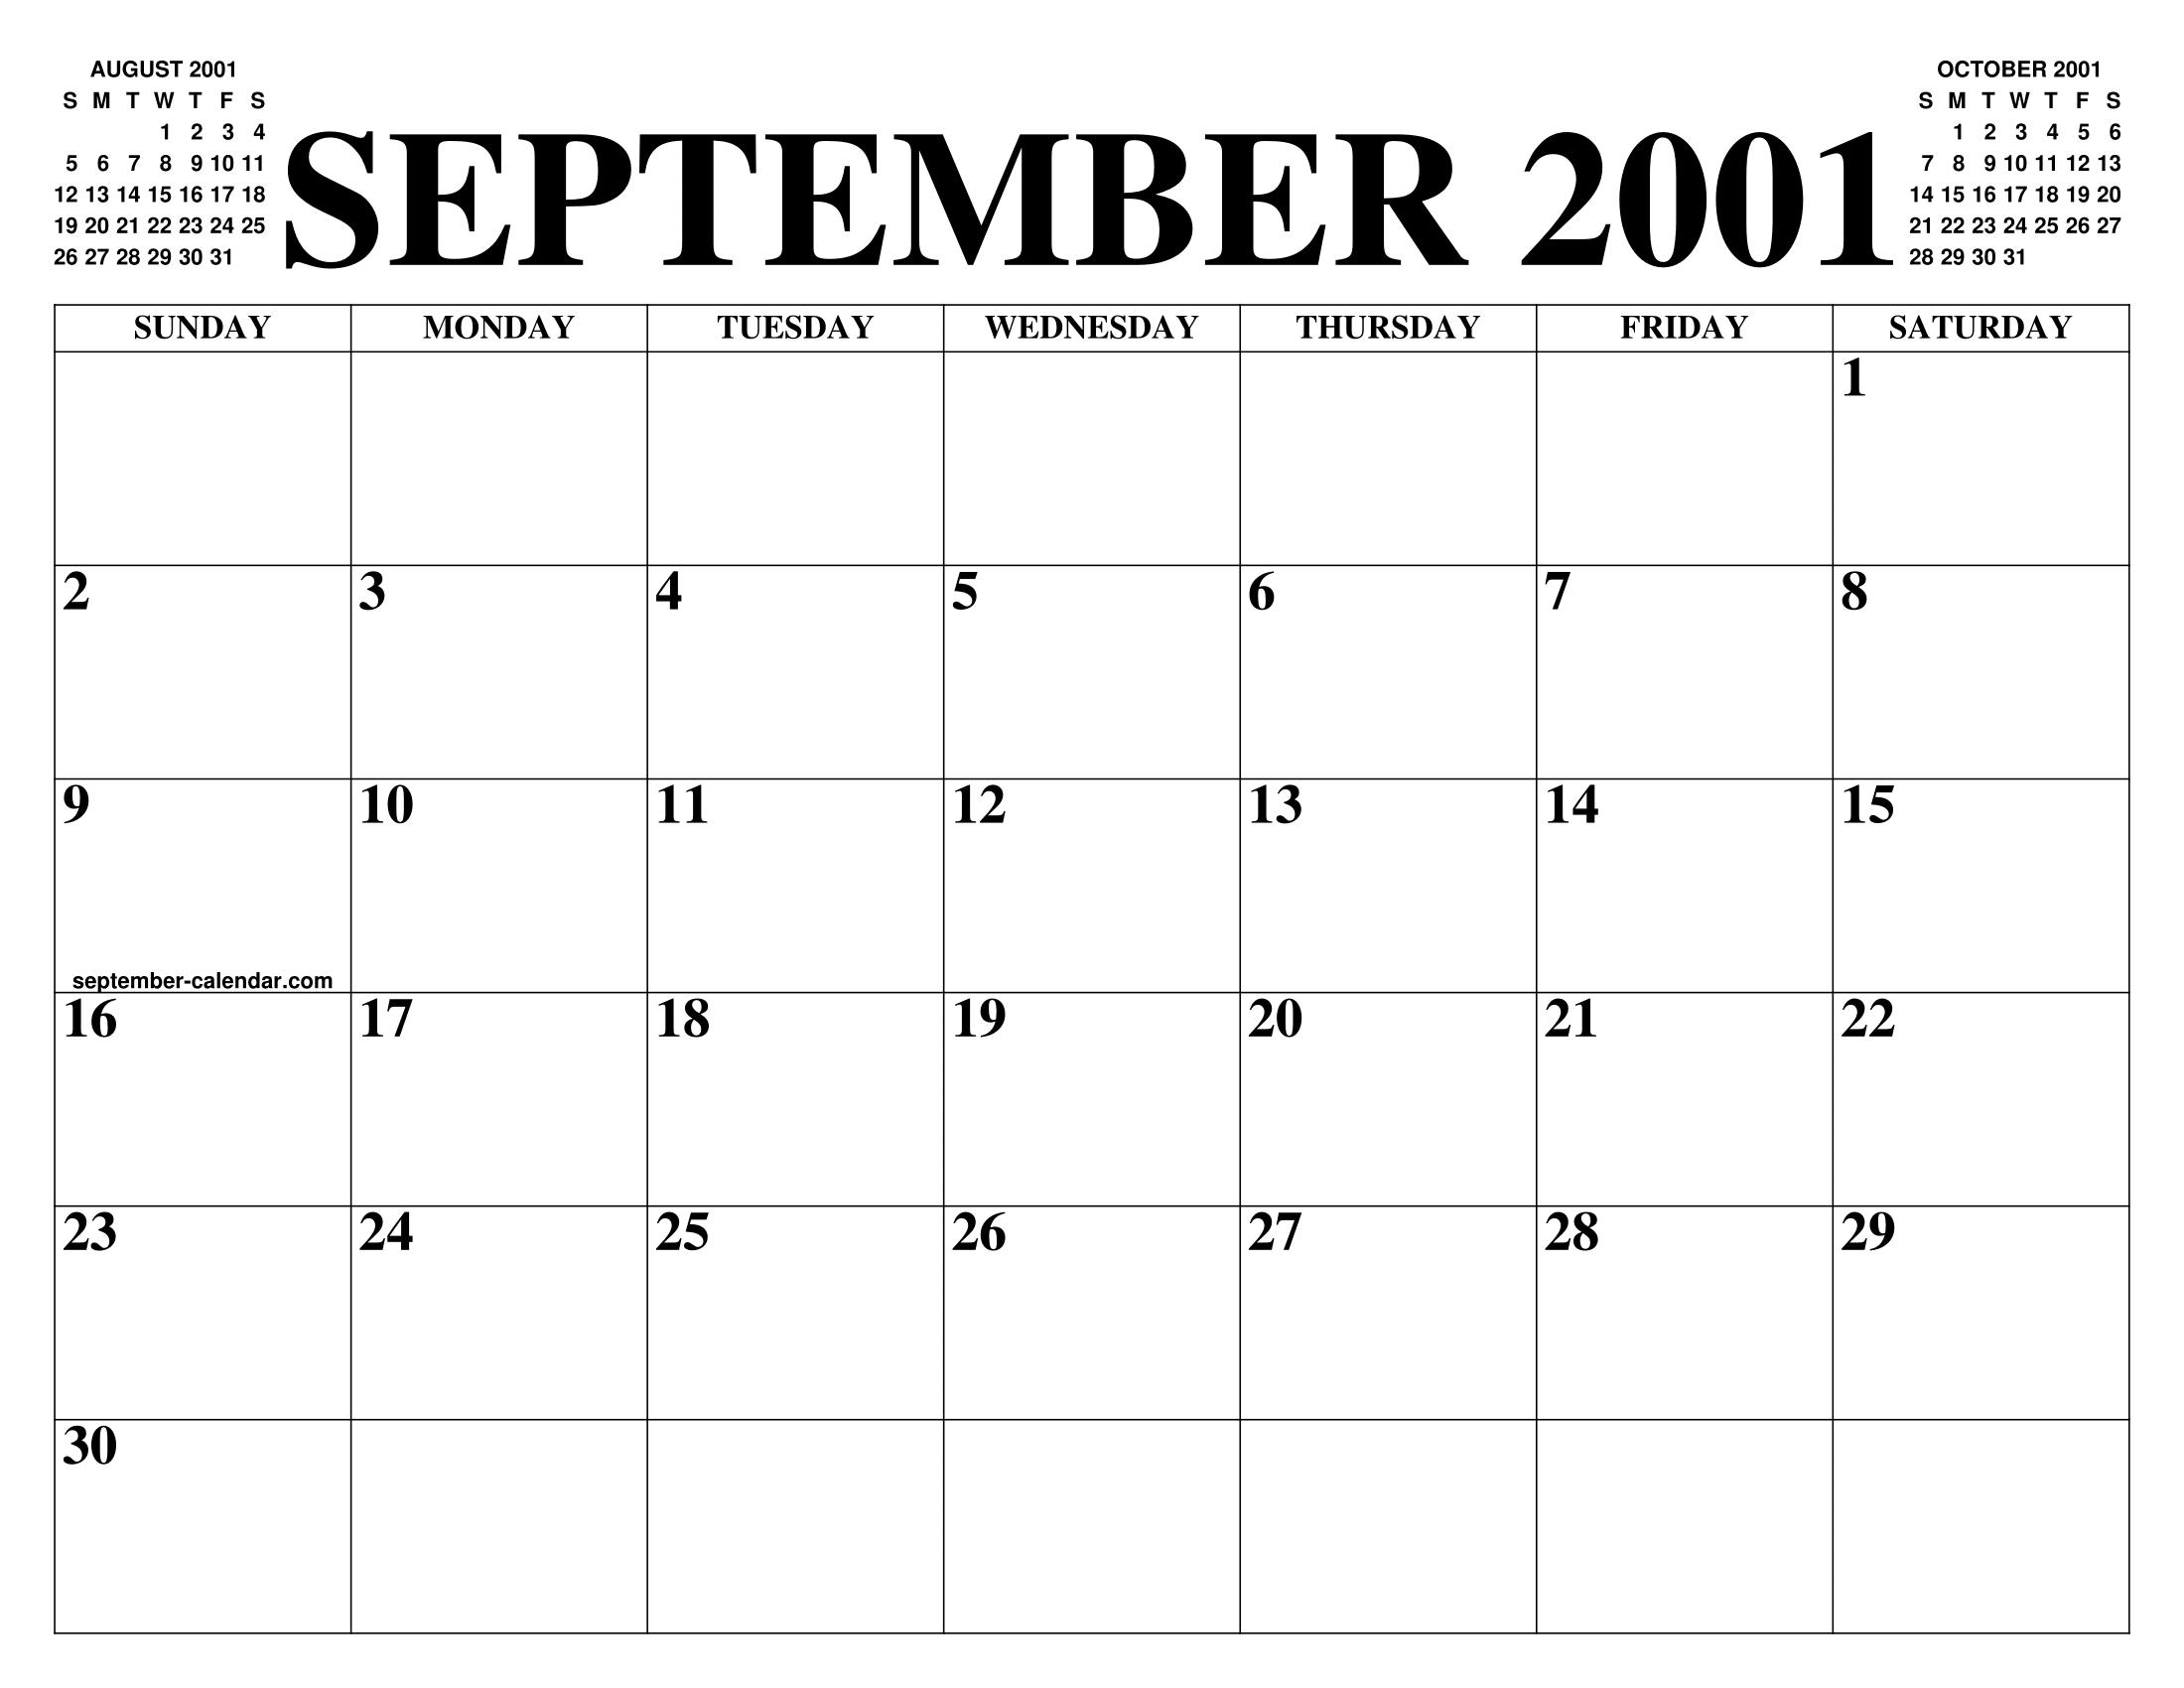 Calendario 2001.September 2001 Calendar Of The Month Free Printable September